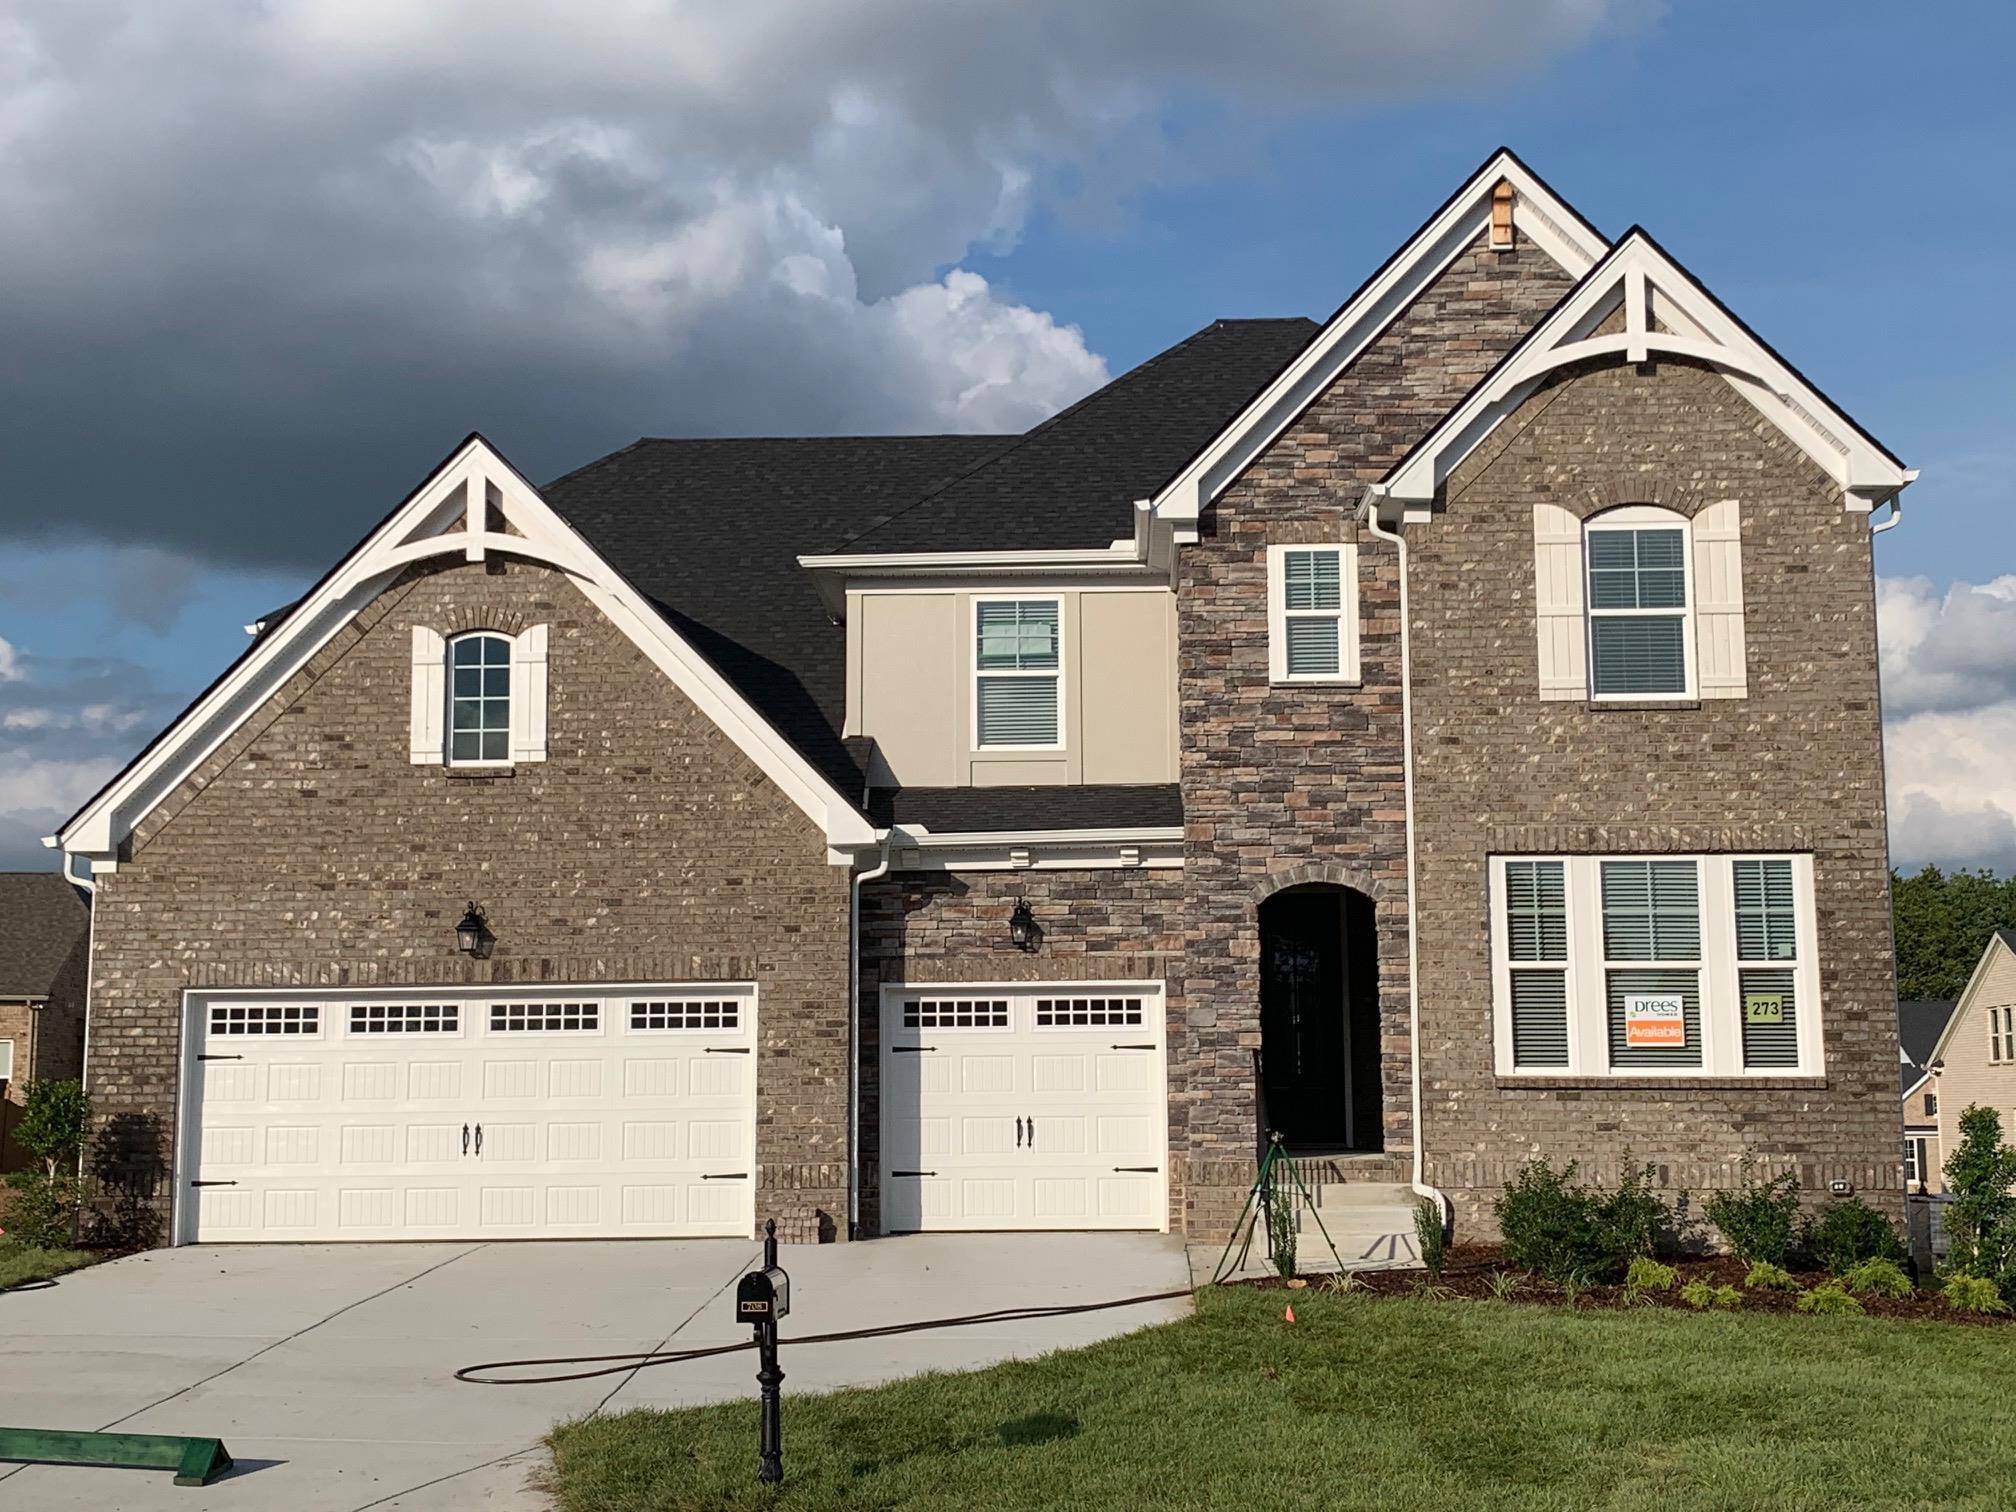 708 Rickfield Court #273, Mount Juliet, TN 37122 - Mount Juliet, TN real estate listing